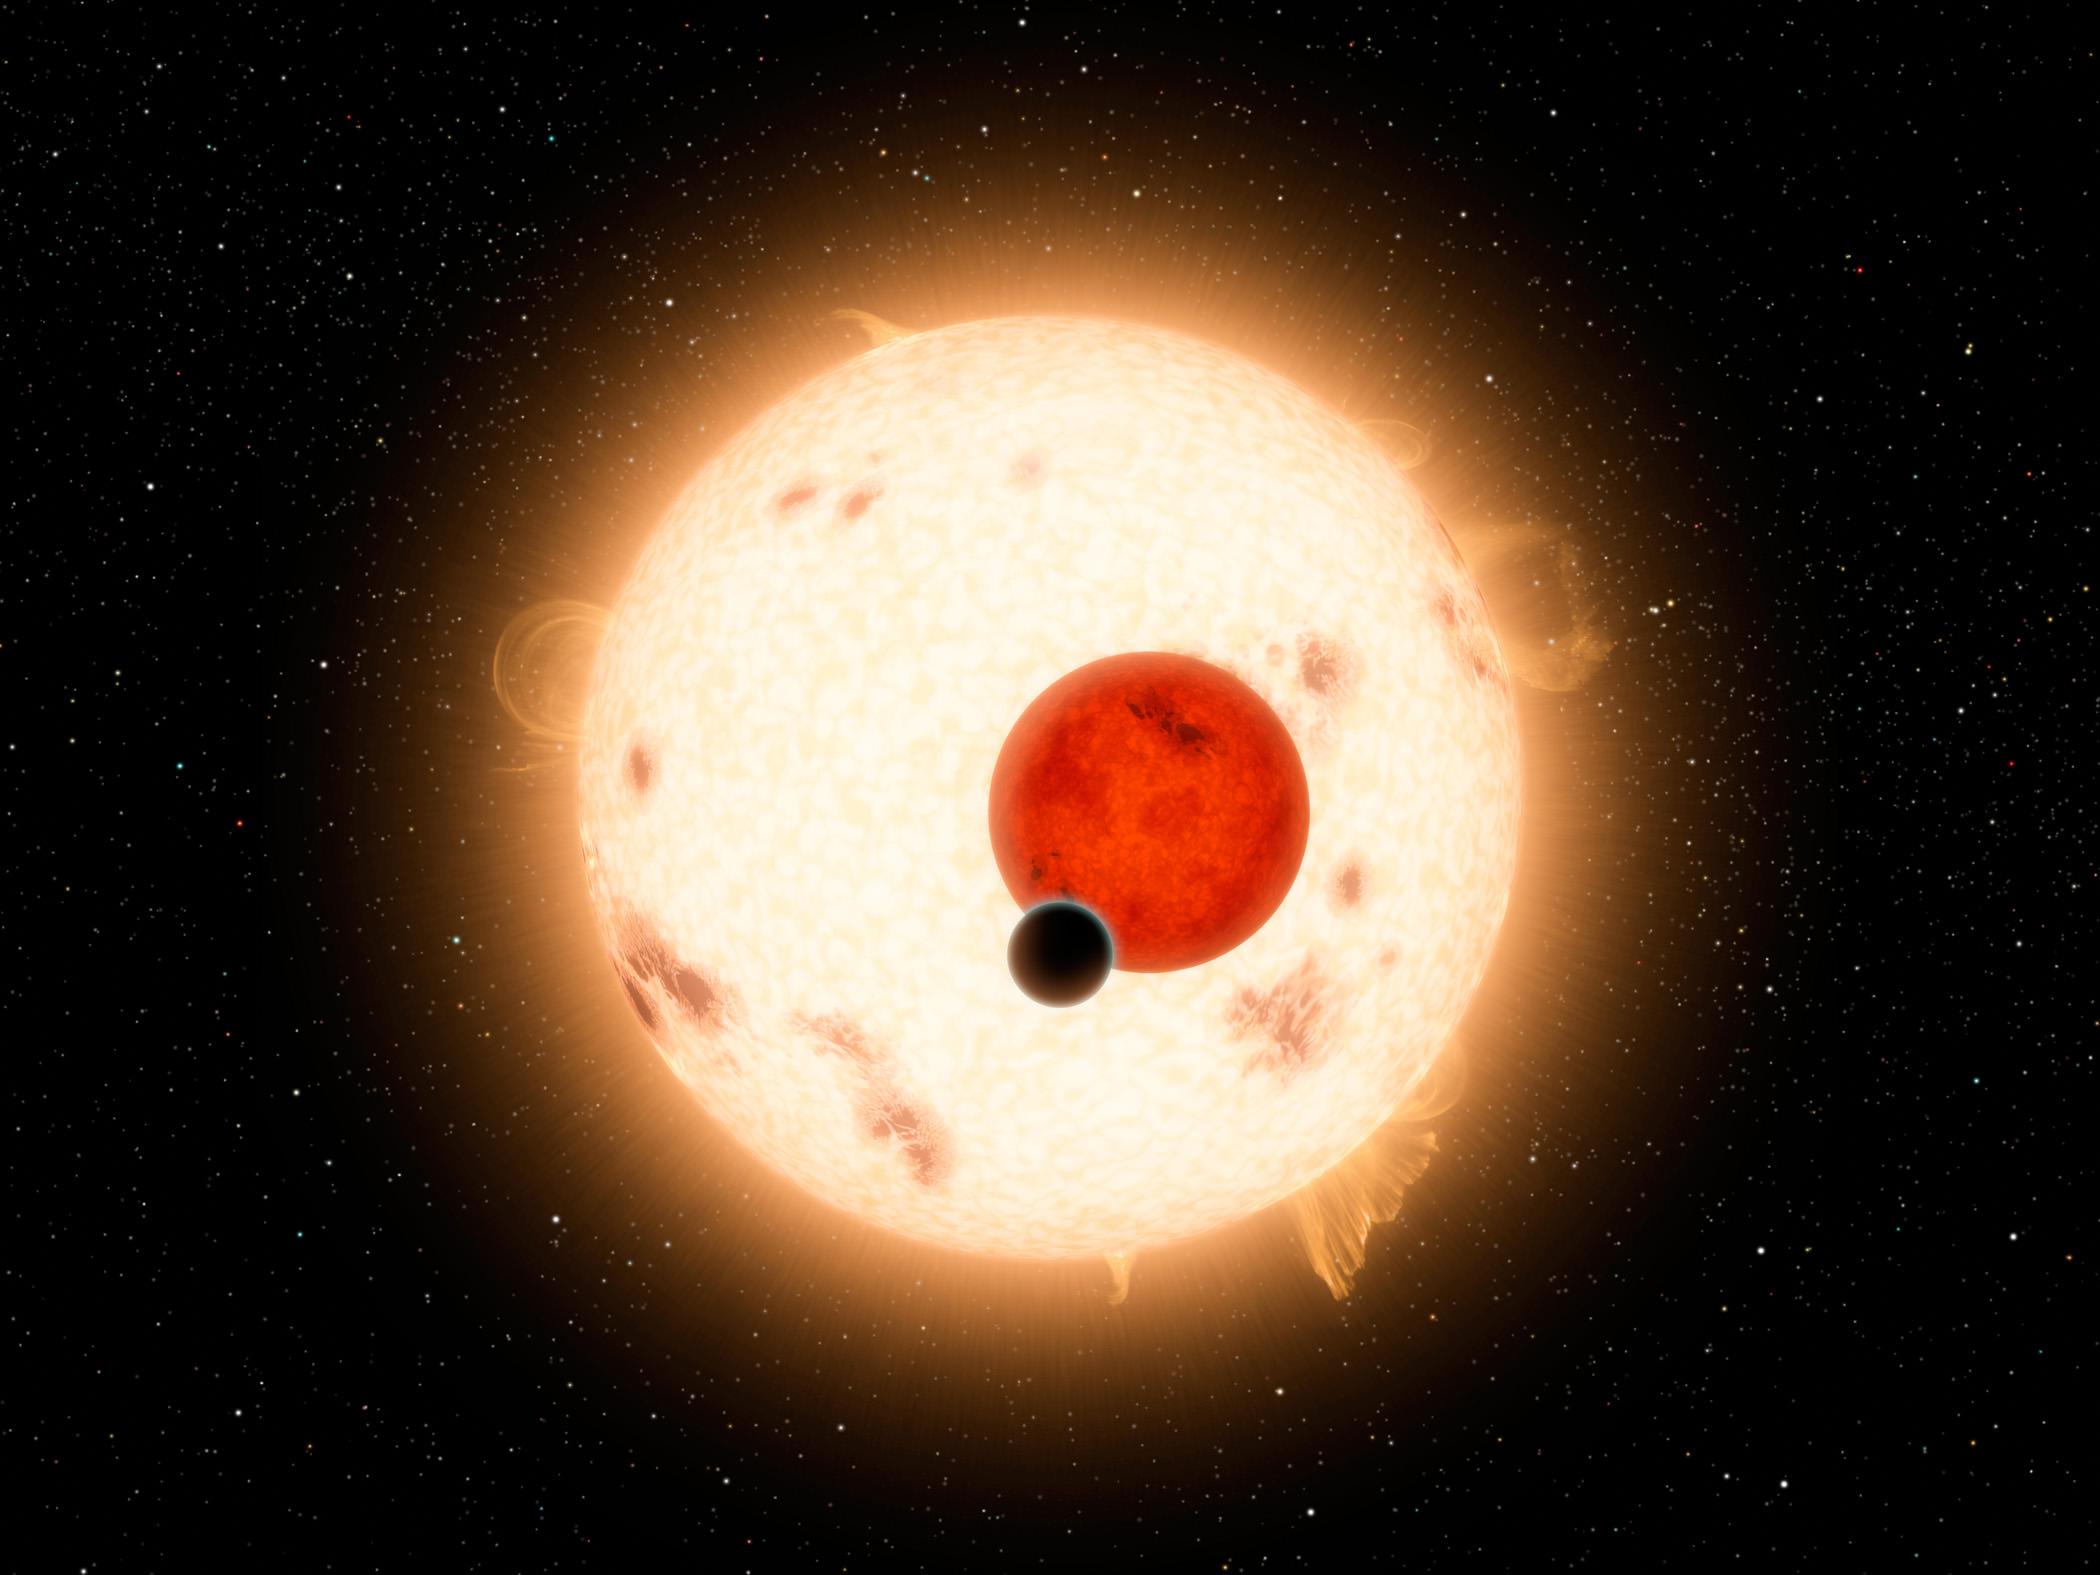 Artist's rendering of Kepler-16b Image Credit: NASA/JPL-Caltech/R. Hurt